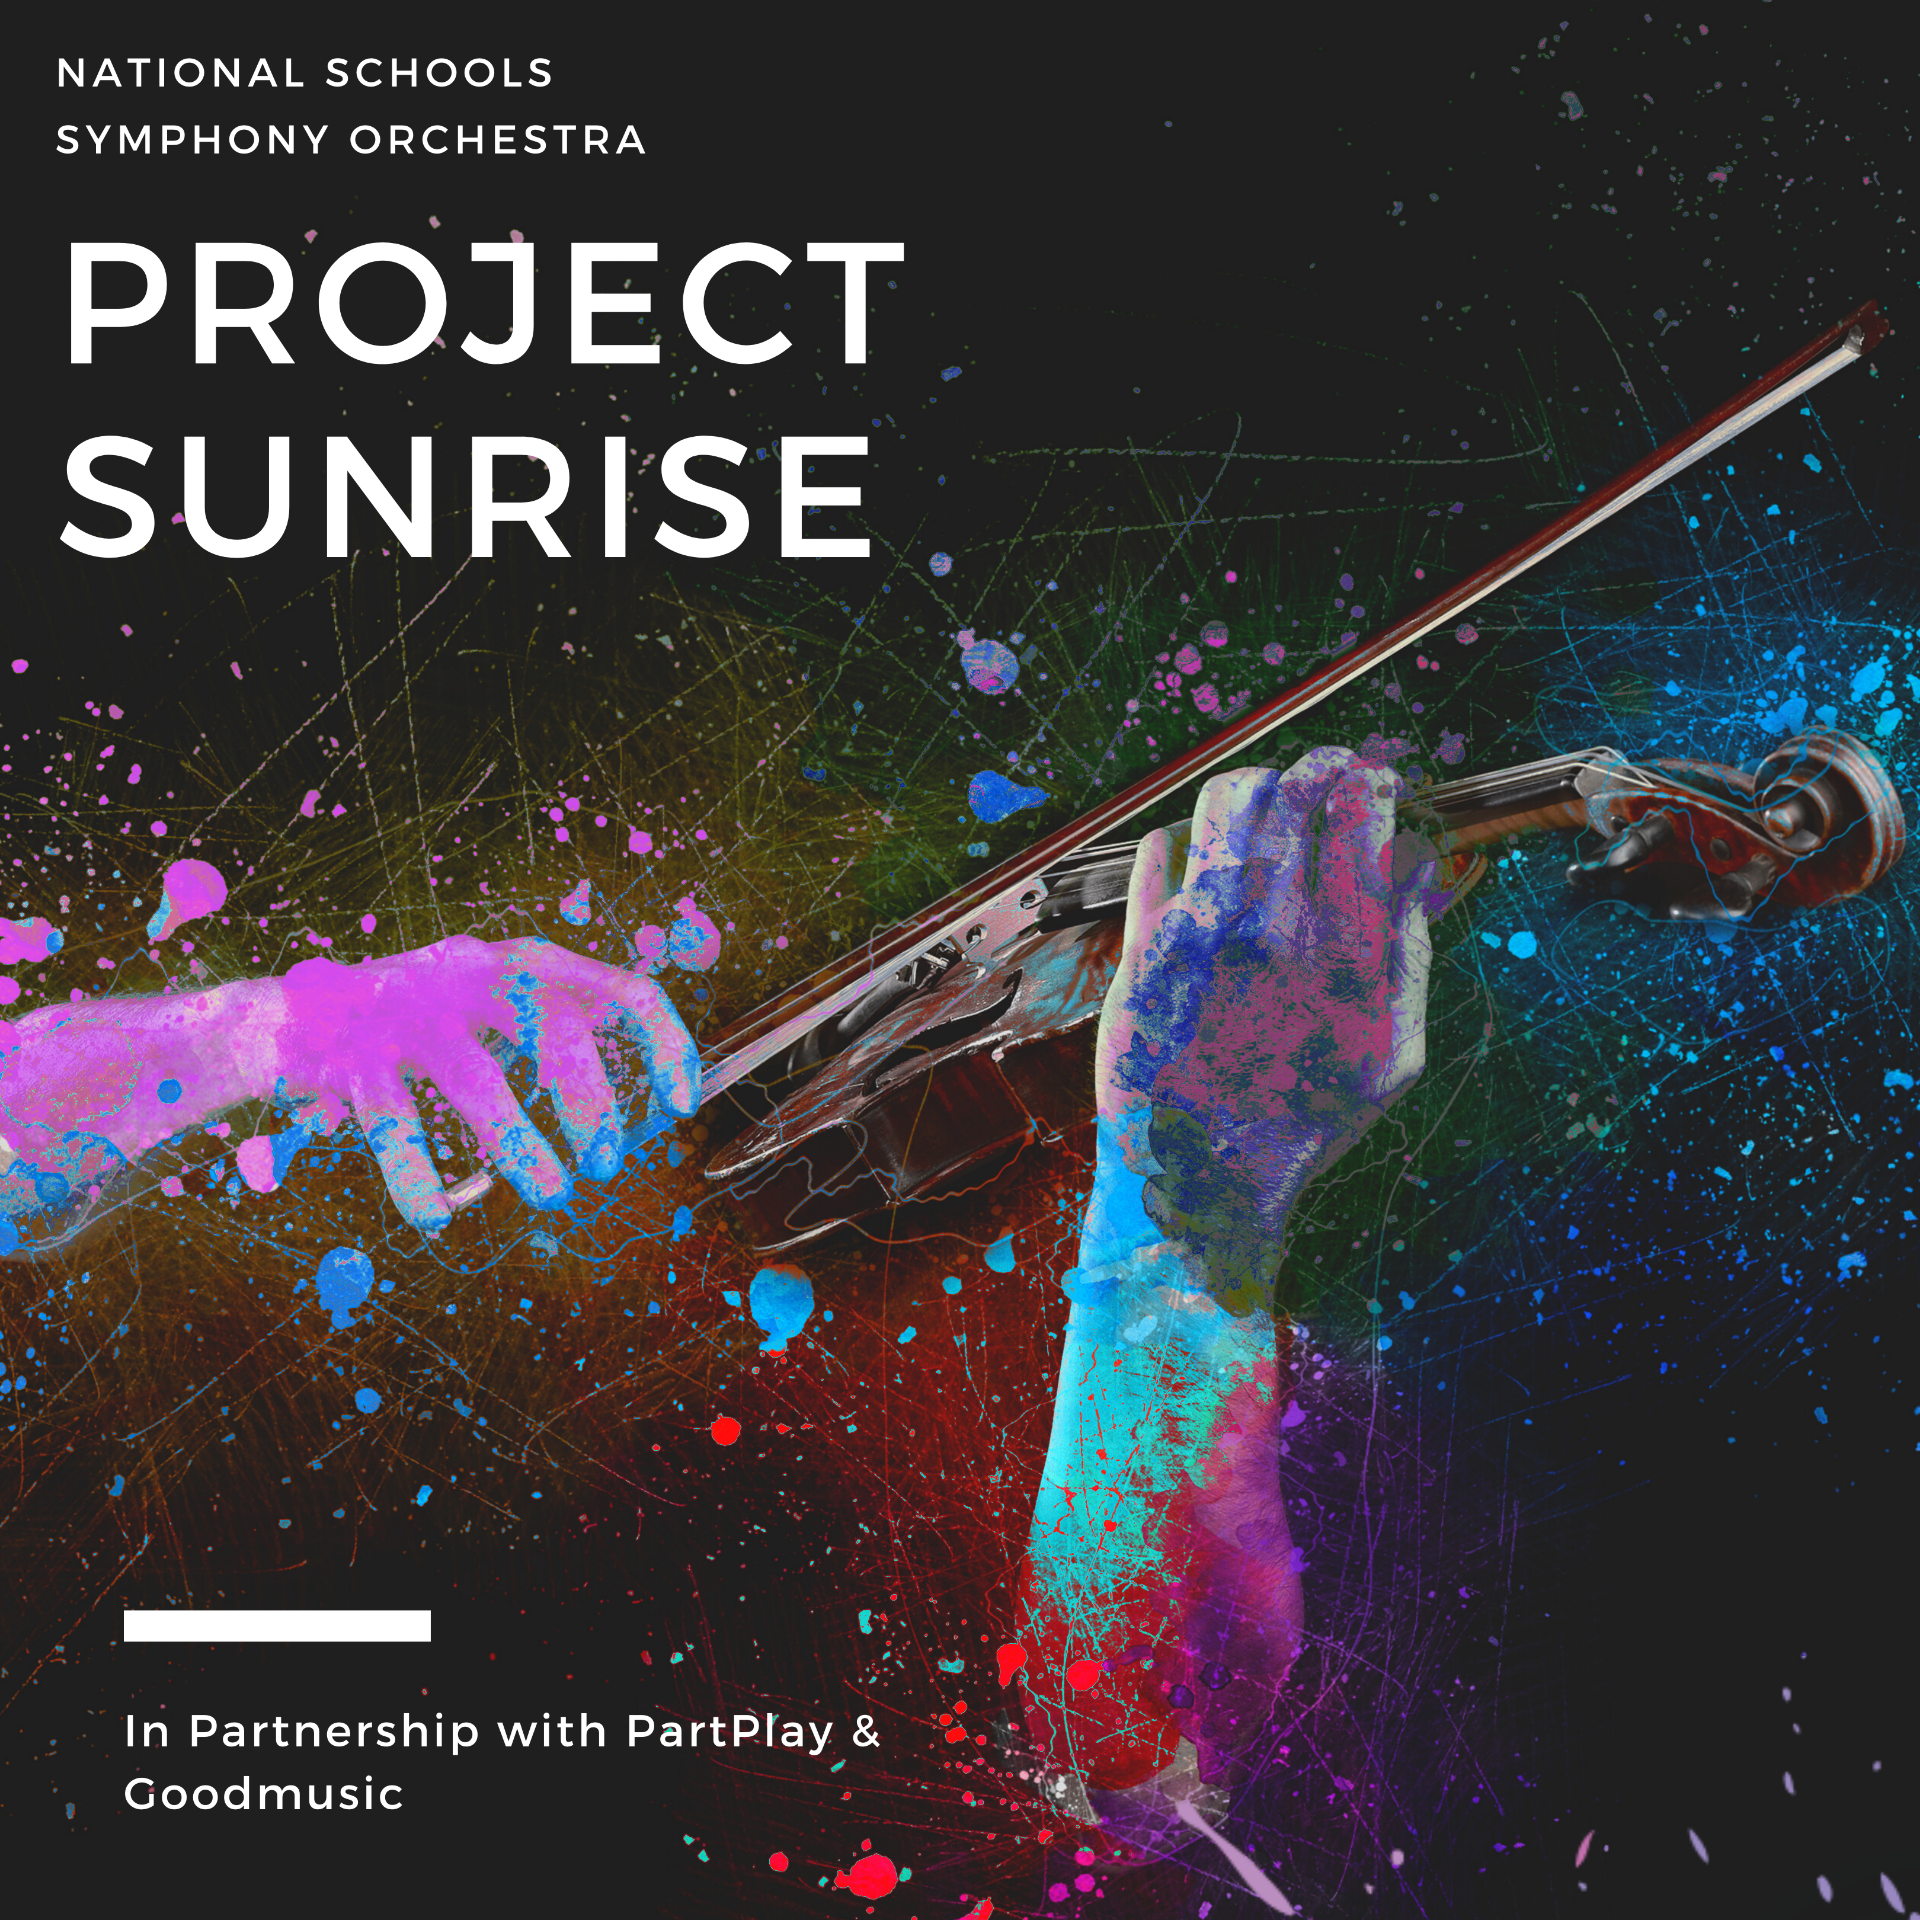 Project Sunrise virtual performance